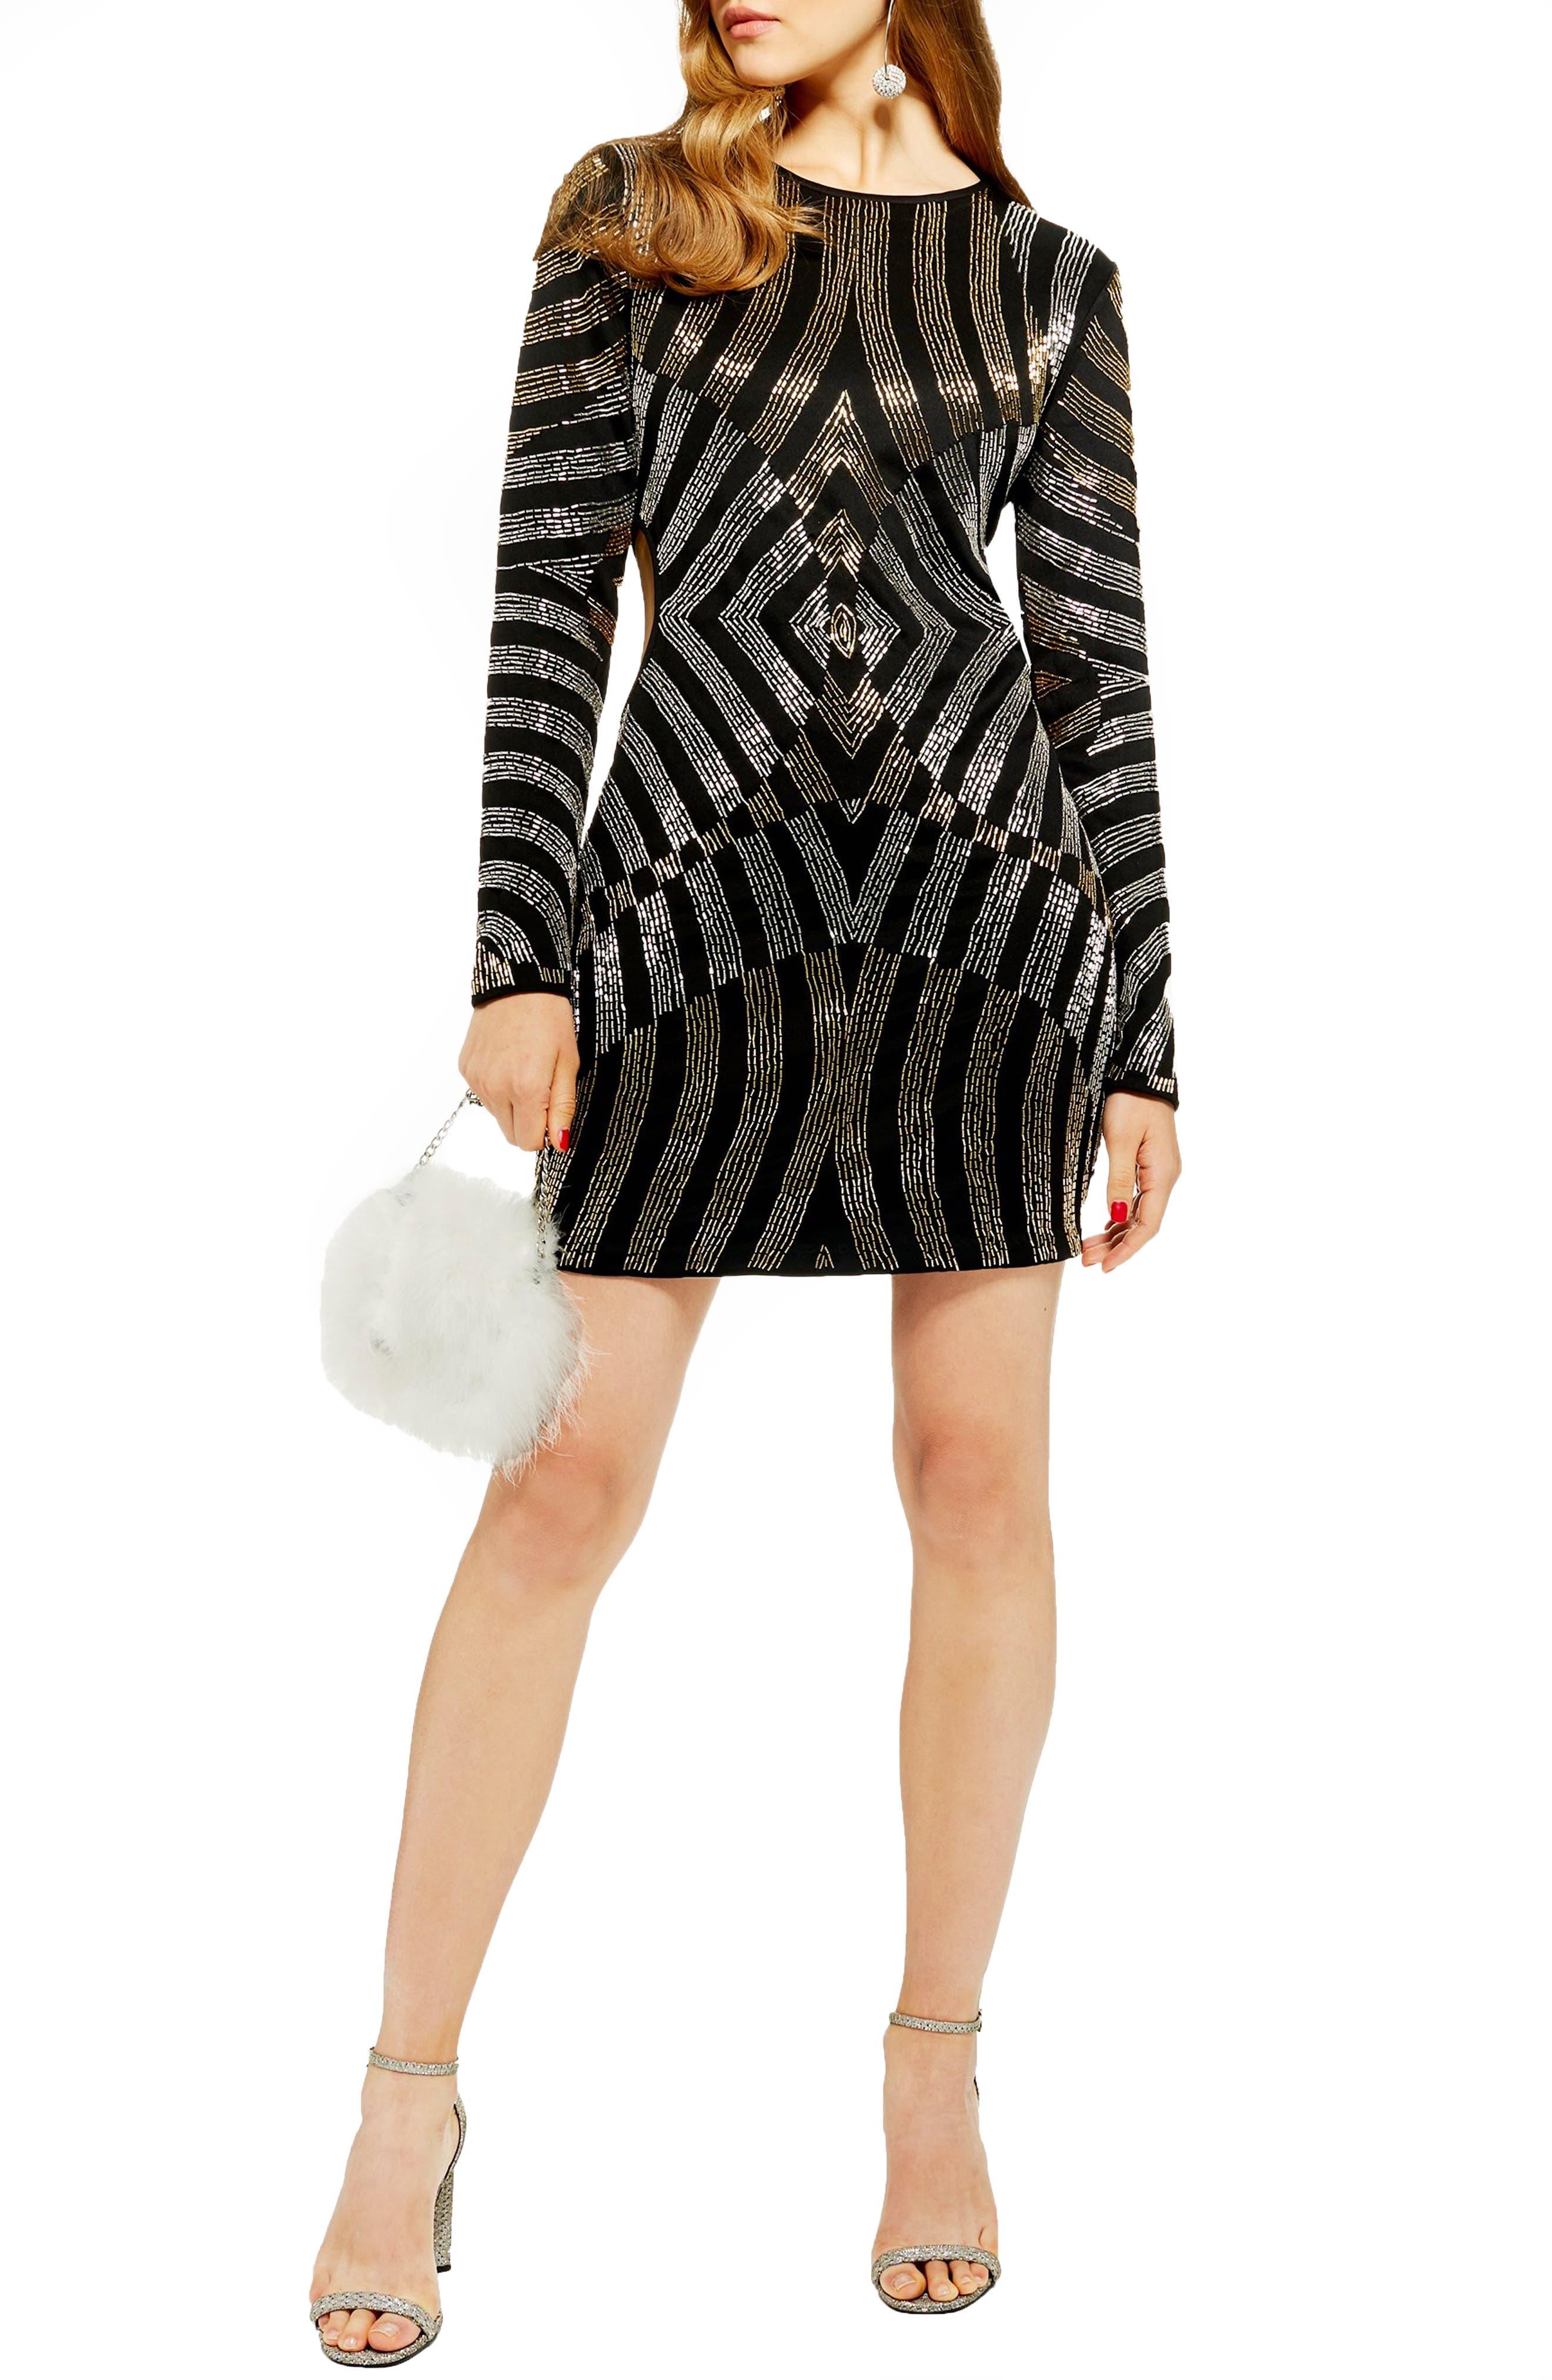 Topshop Bugle Bead Cutout Body-Con Dress, US (fits like 0) - Black